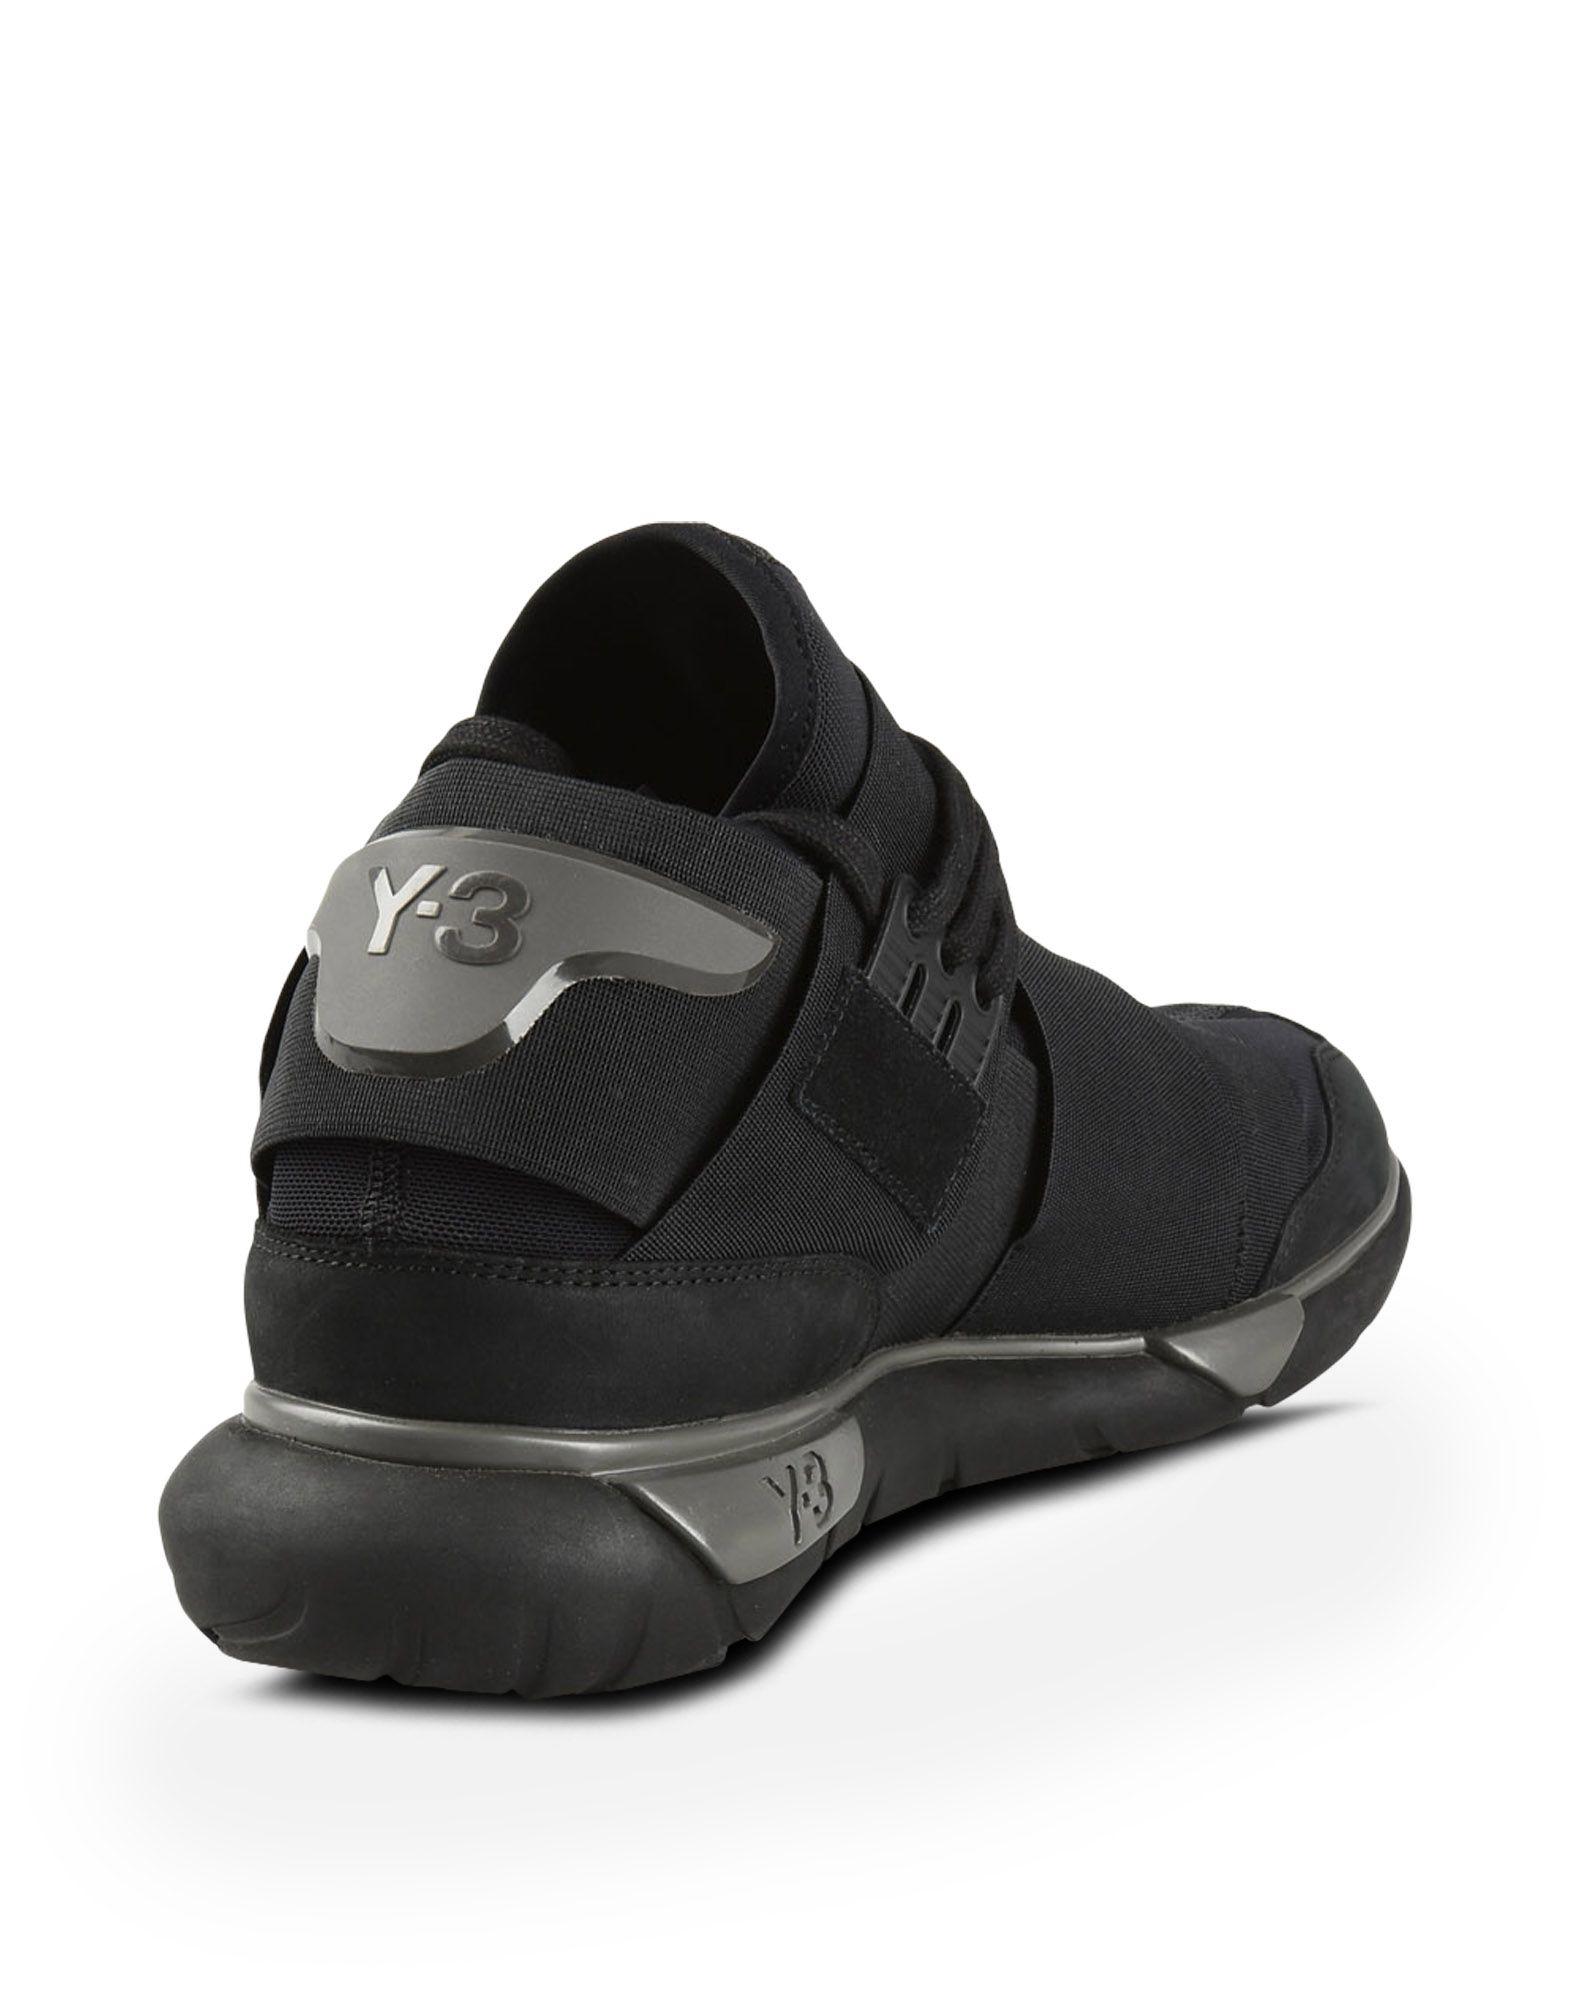 196bd61fbd398 ... Y-3 Y-3 QASA HIGH Sneakers Man d ...